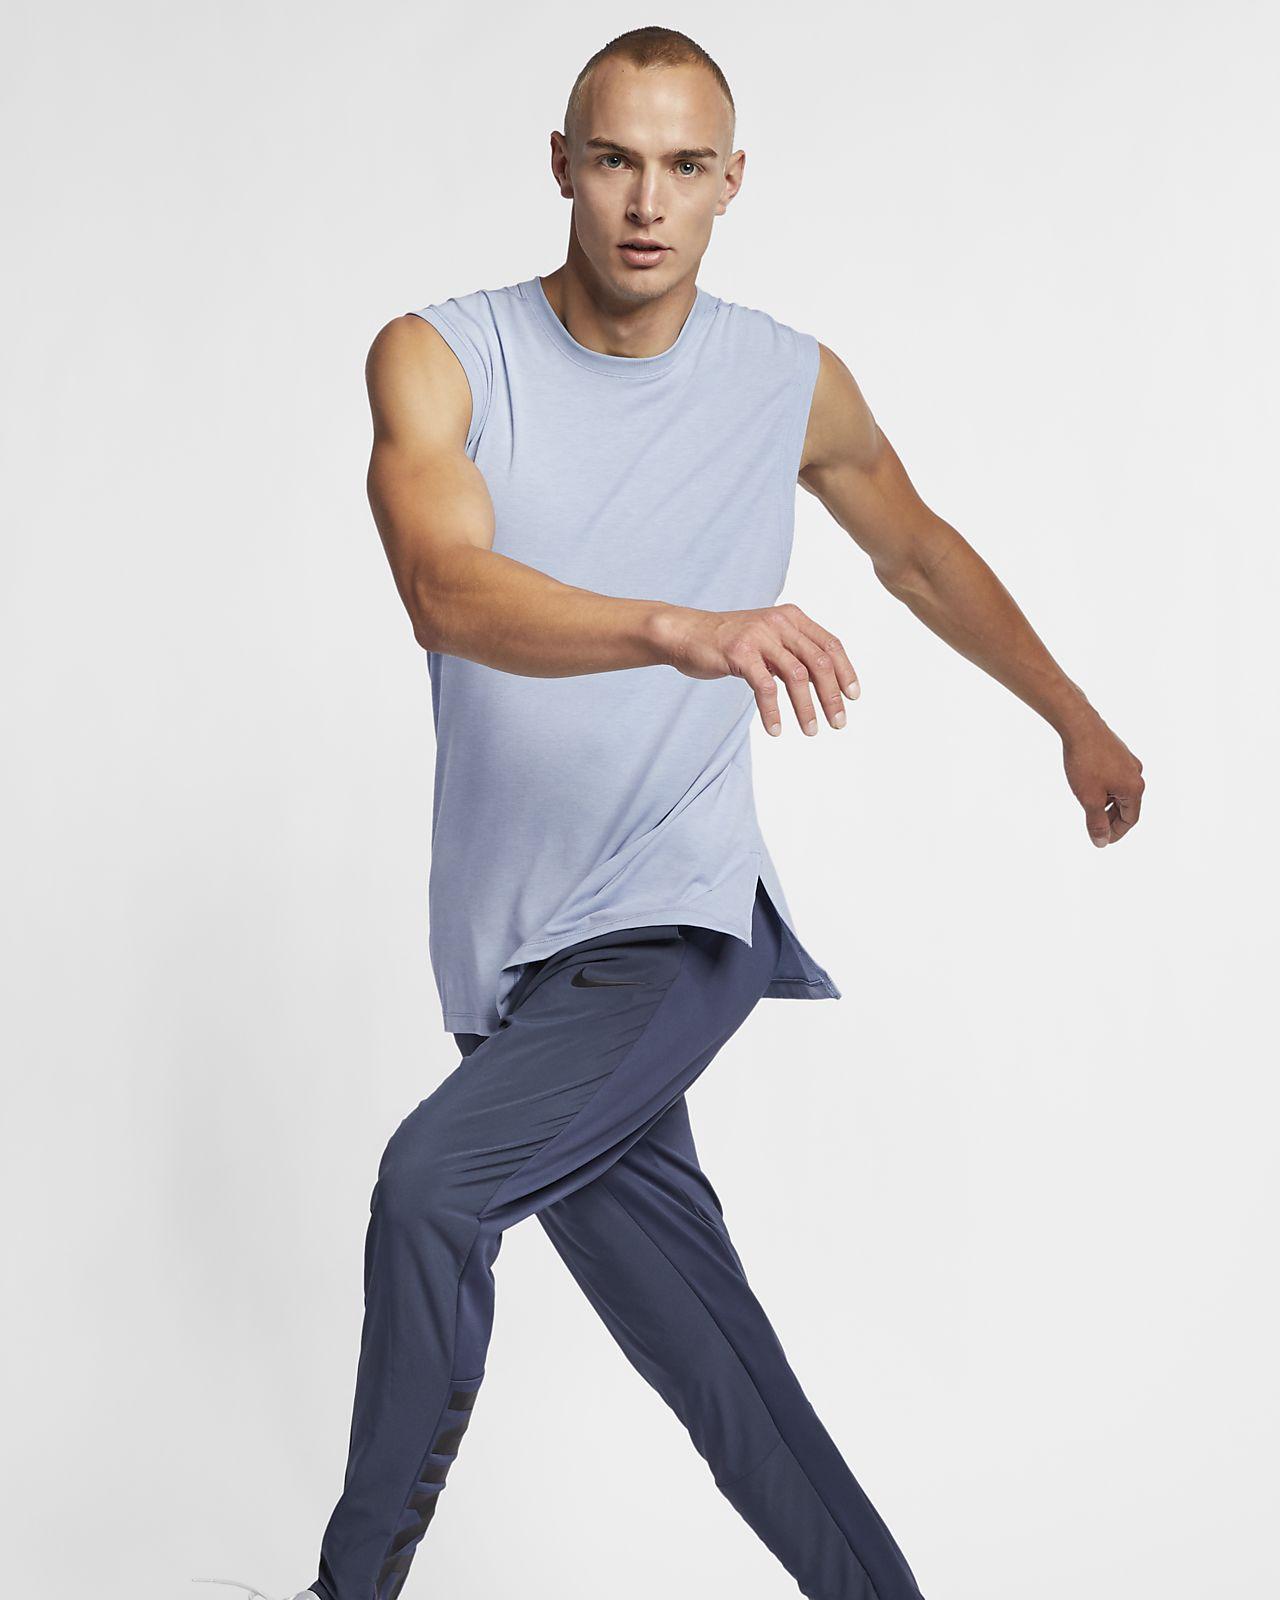 Canotta da yoga Nike Dri-FIT - Uomo